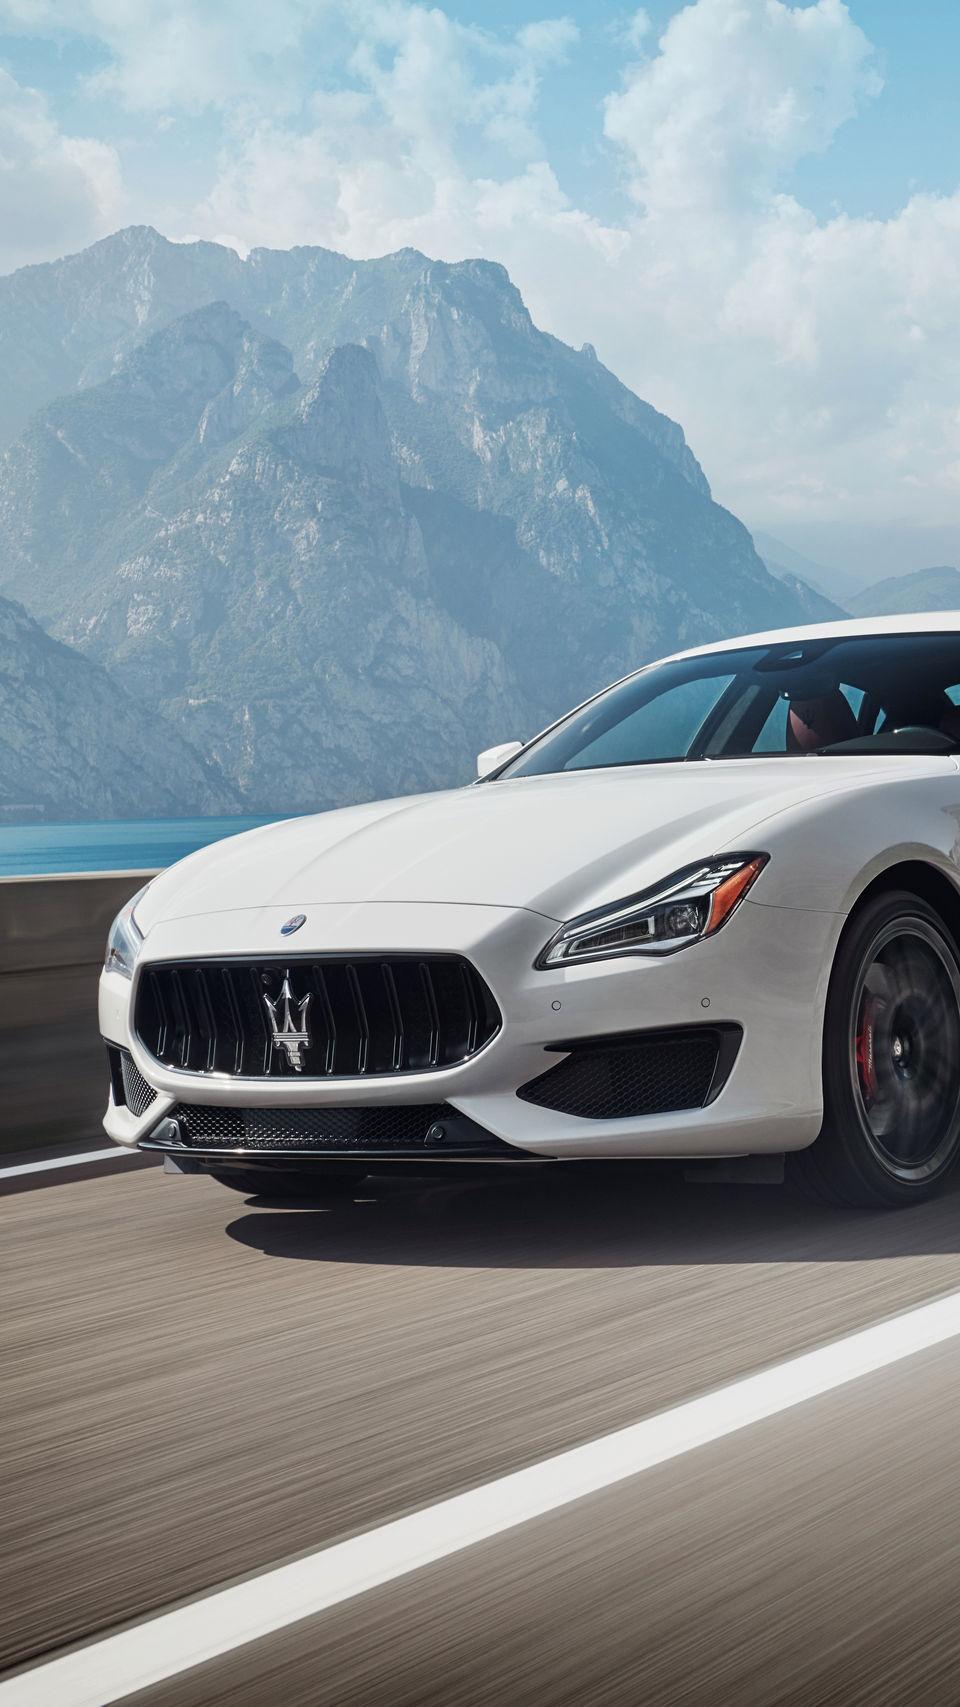 Maserati Quattroporte GTS – the luxury sedan in Bianco color on the road